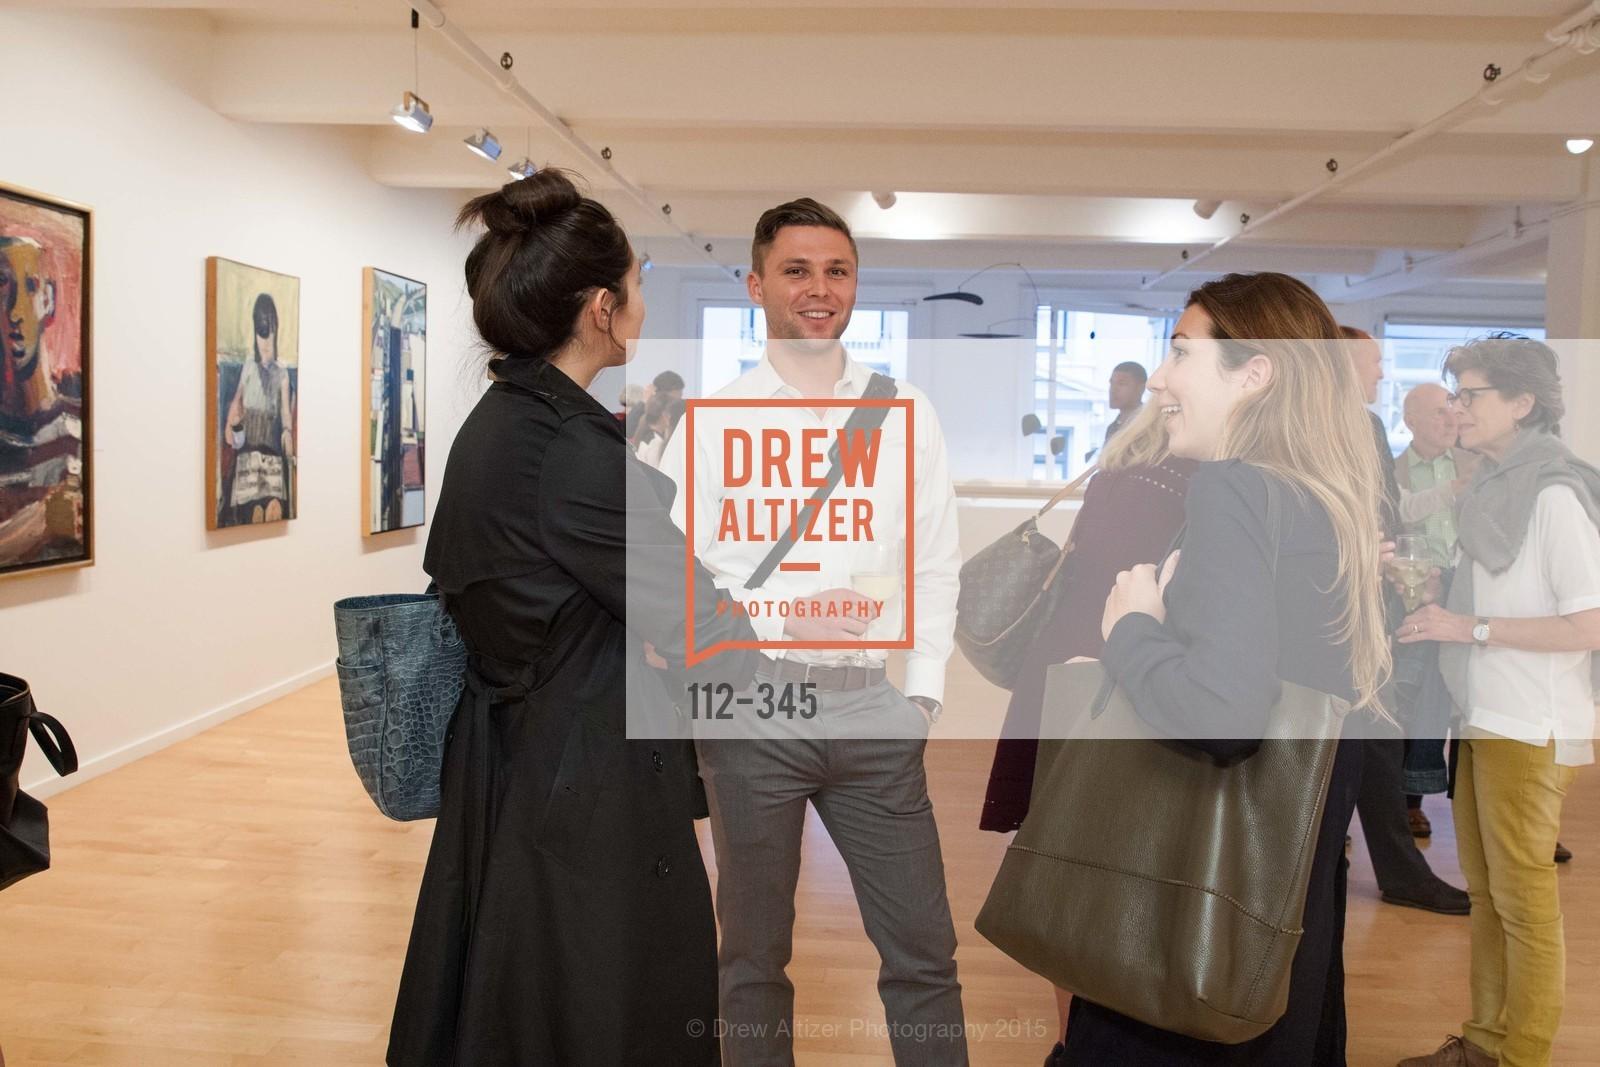 Andrew Cereghino, John Berggruen Gallery presents